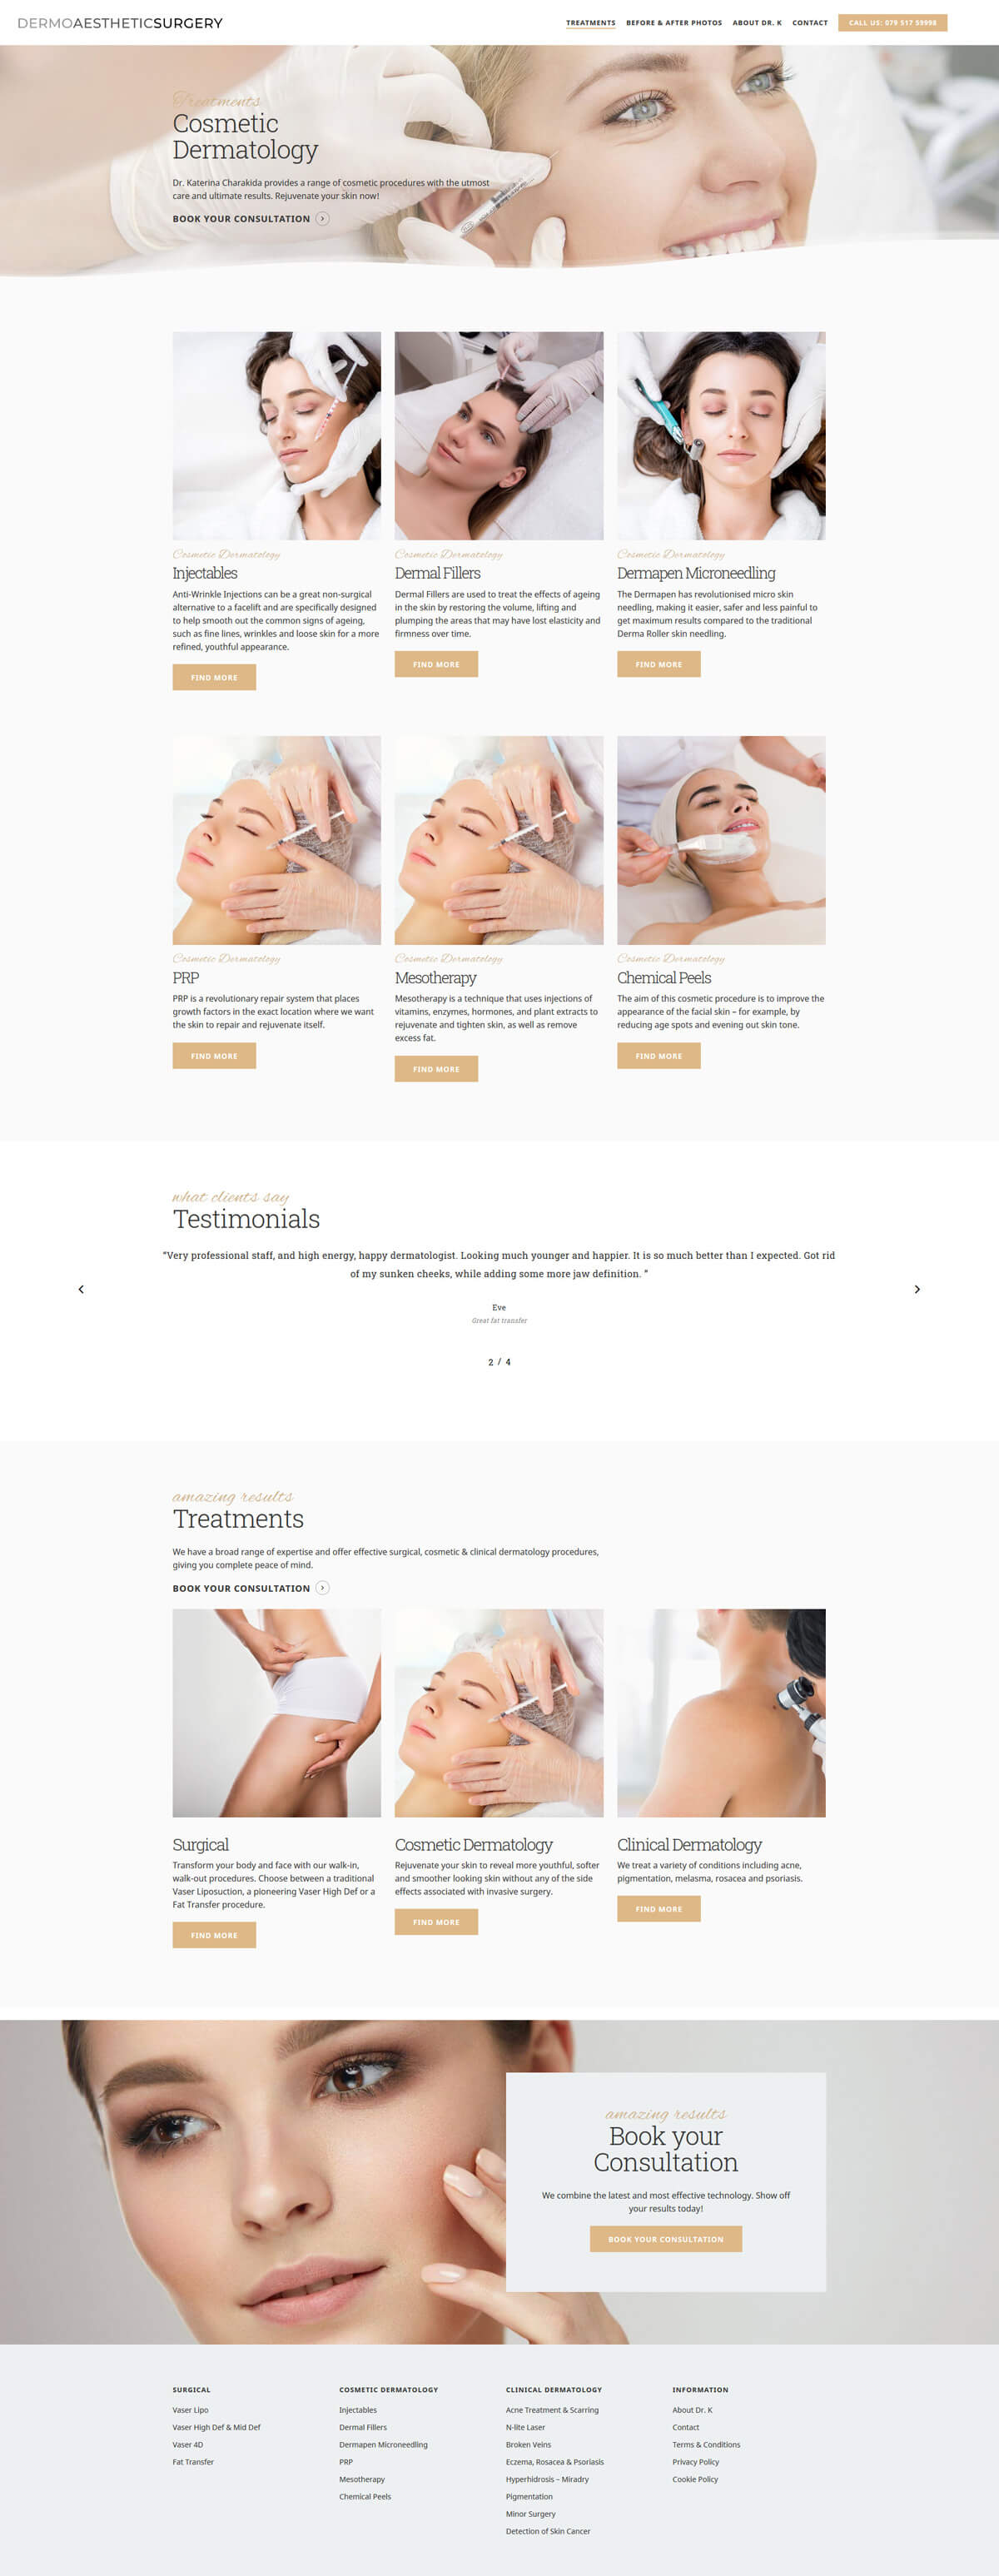 Dermo Aesthetic Surgery - dermoaestheticsurgery.com - Case Study 3 - developed by Digital Artifacts Creative